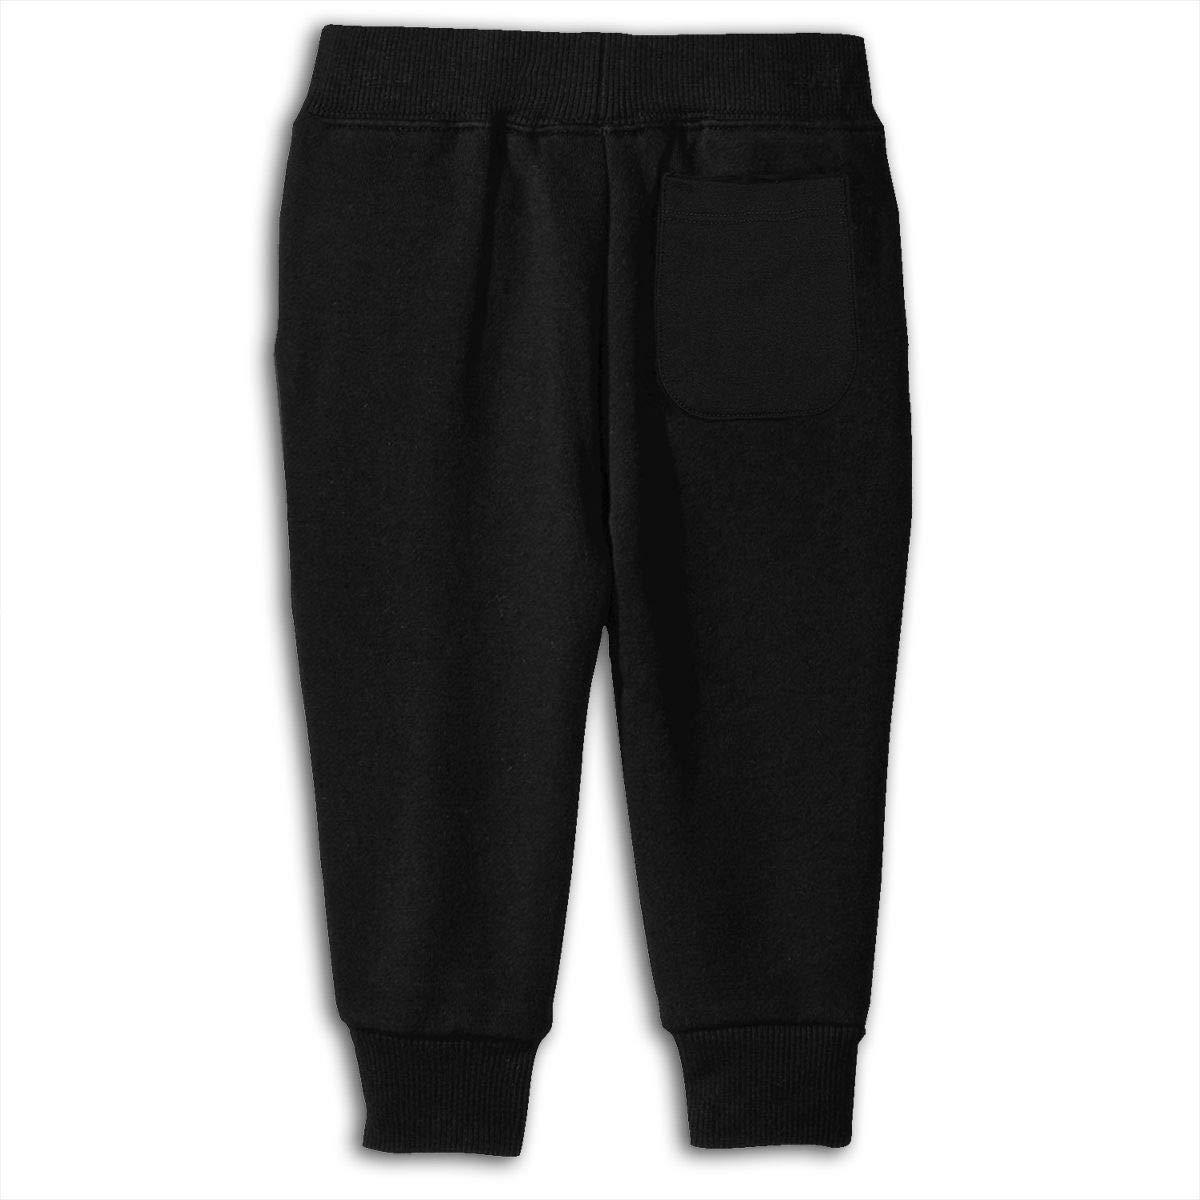 Printed Nurse Badss Lifesaver Child Boys Girls Unisex Cool Sweatpants